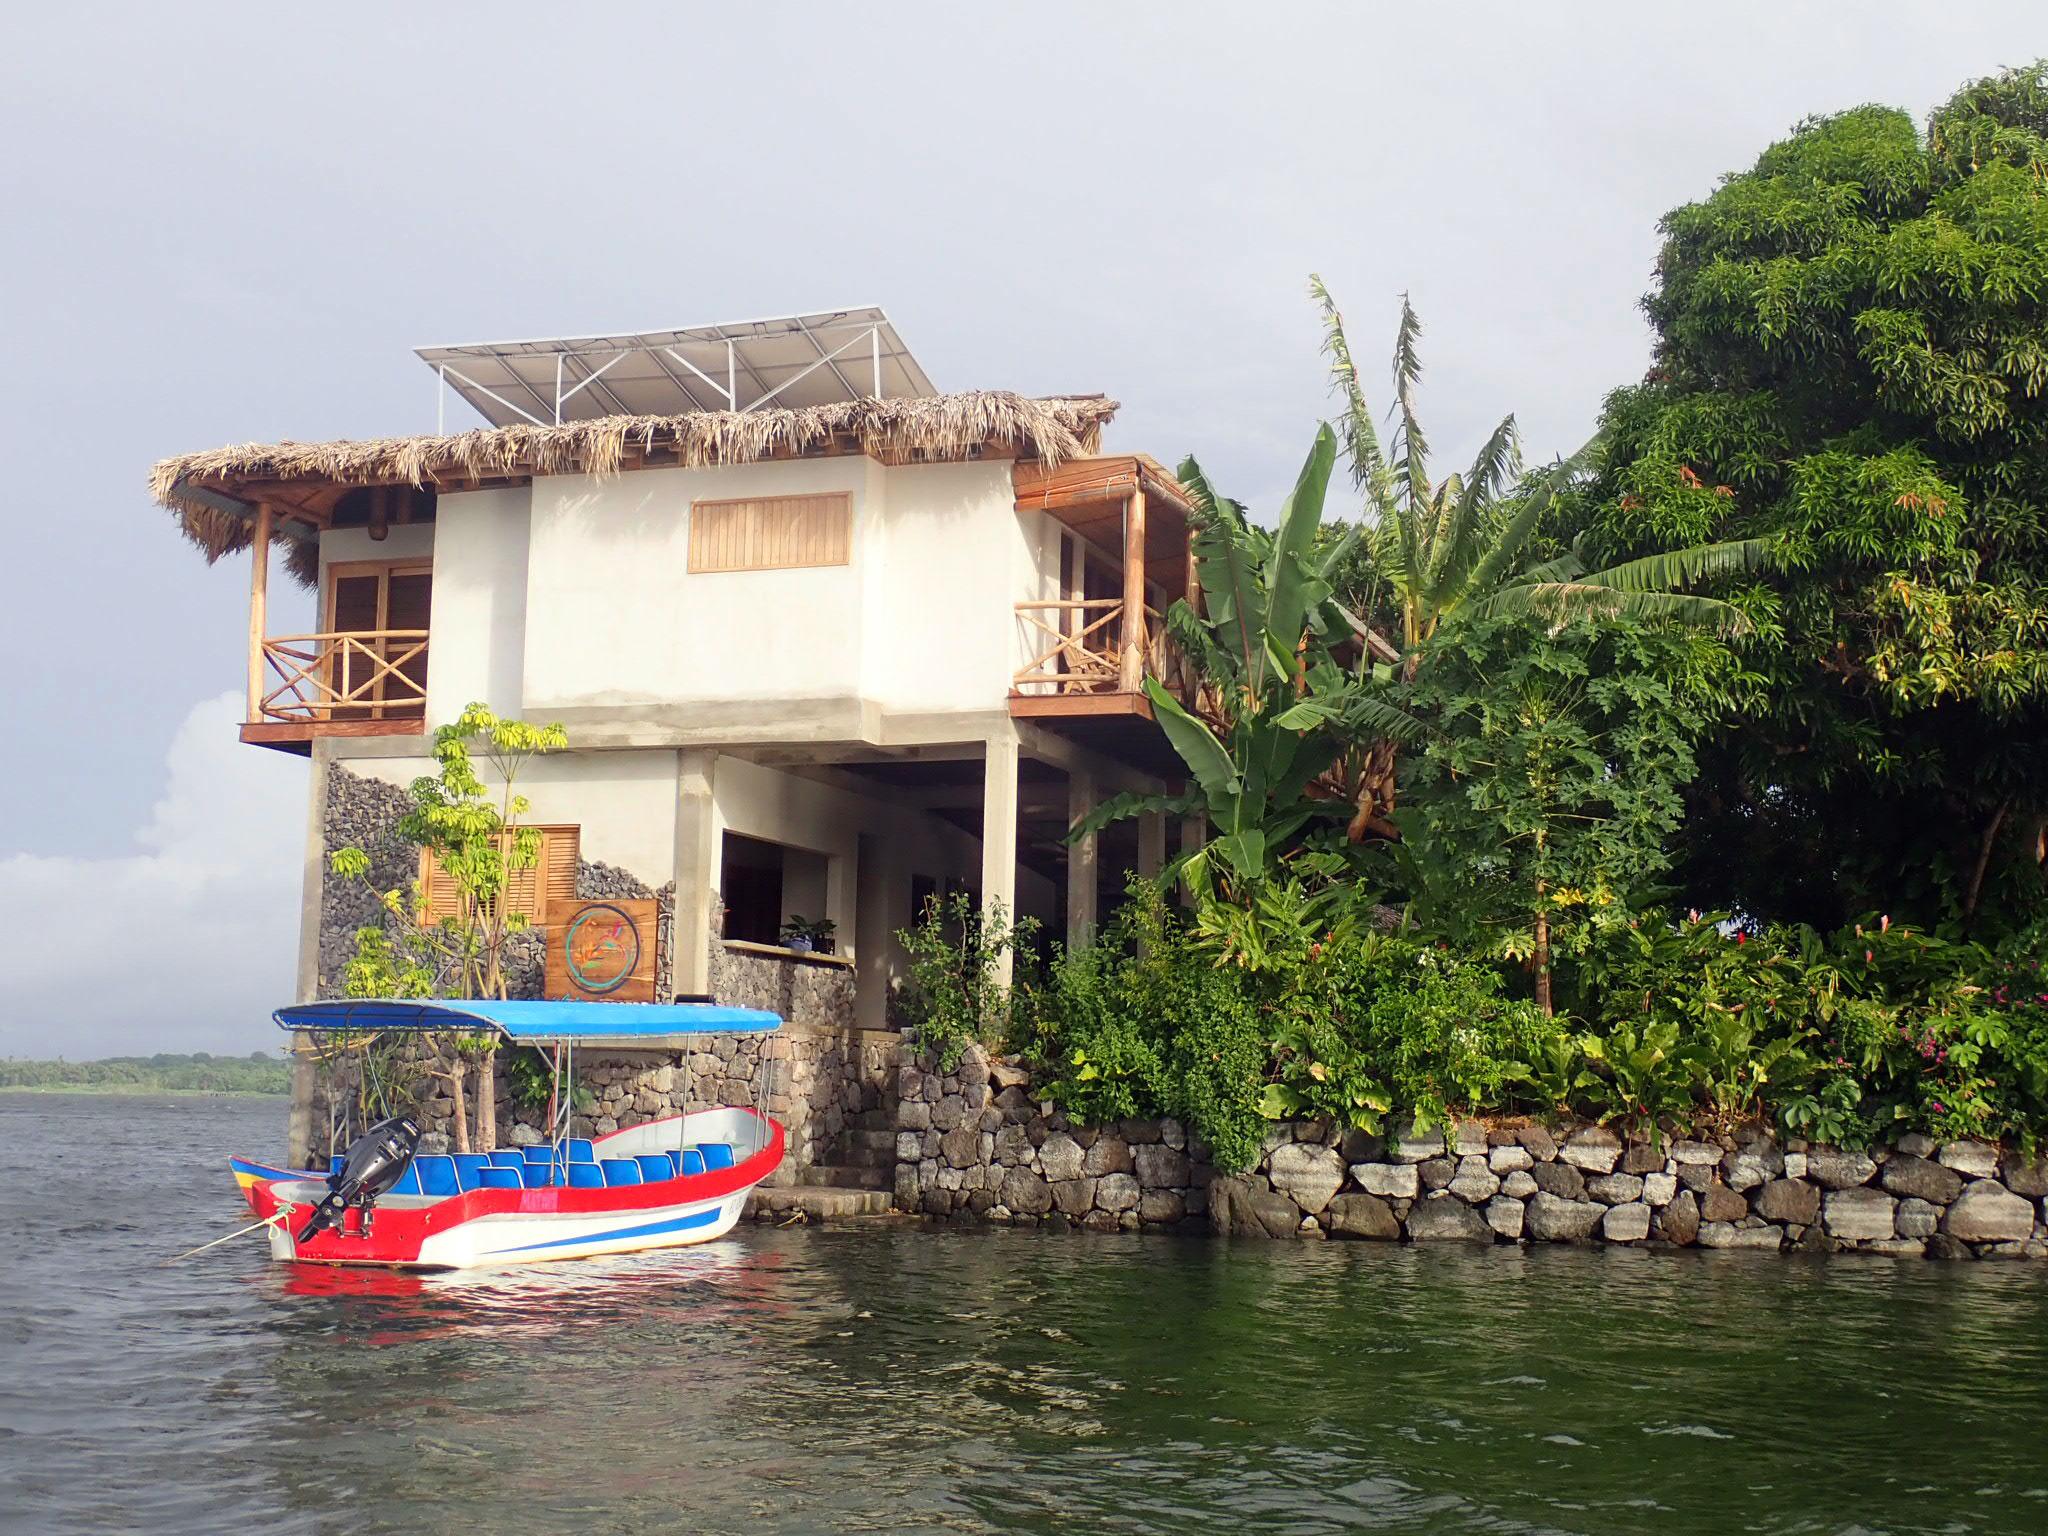 Granada | Granada, Nicaragua | Nicaragua | Islets of Granada | Lake Nicaragua | Nicaragua travel | Nicaragua bucket list | Nicaragua travel guide | Ana Jacqueline | anajacqueline.com